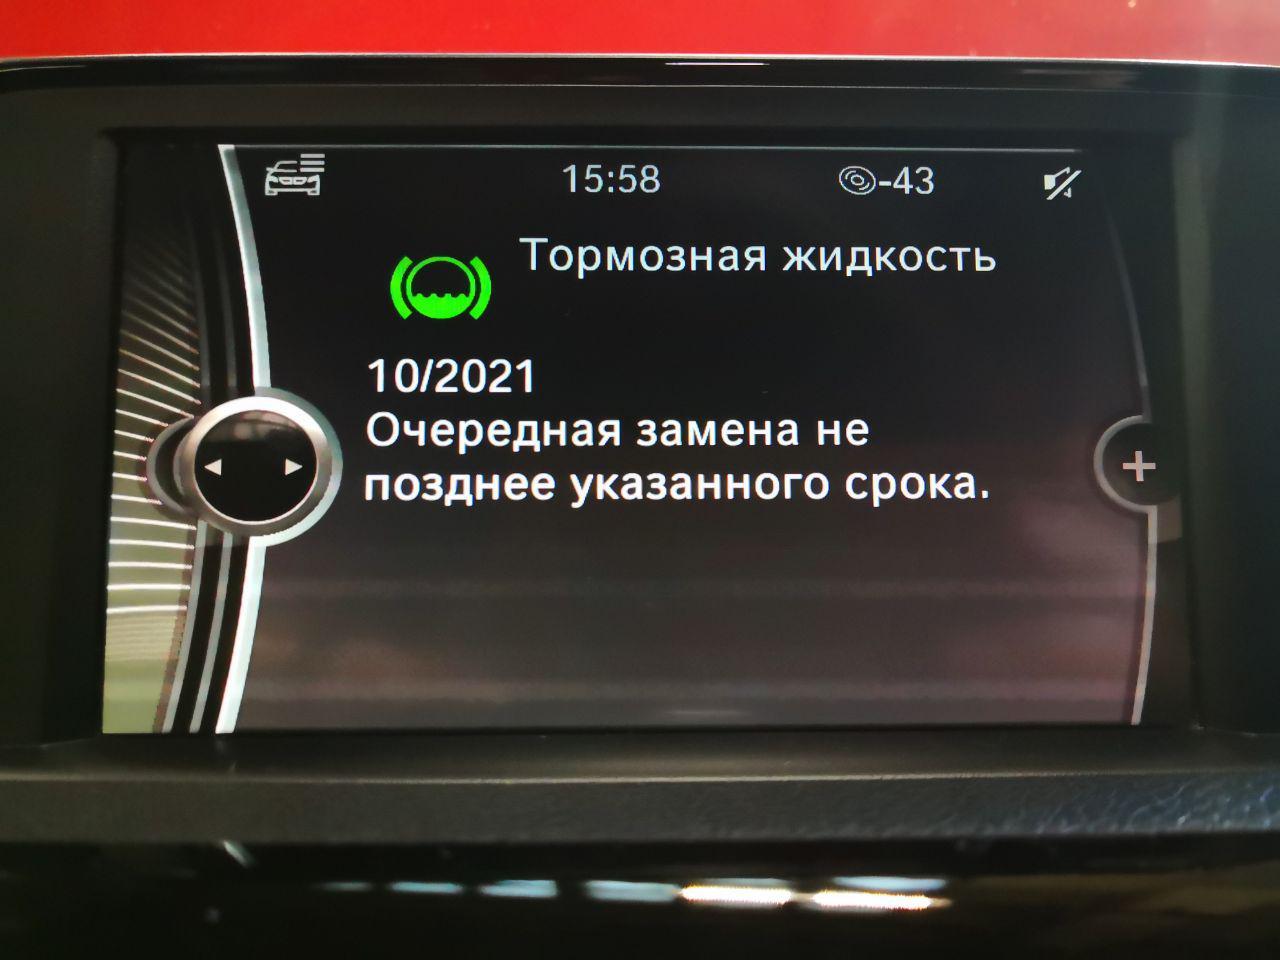 Замена тормозной жидкости, BMW F30